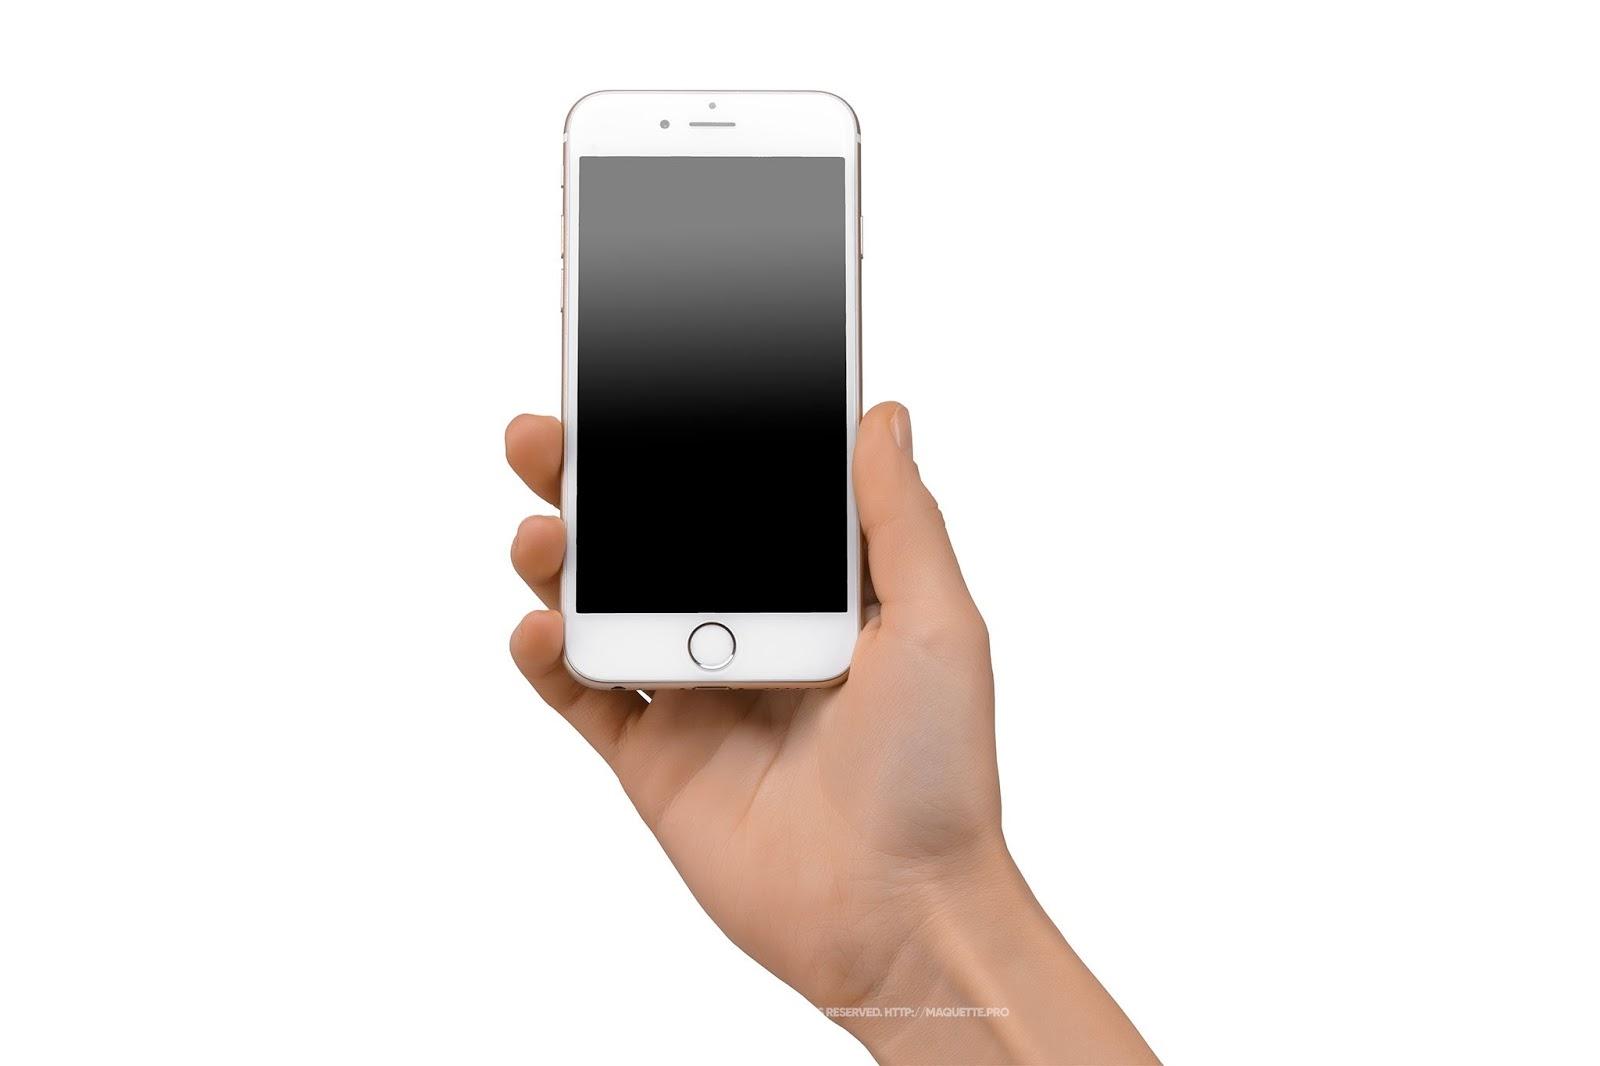 panduan cara tips beli iphone second hand